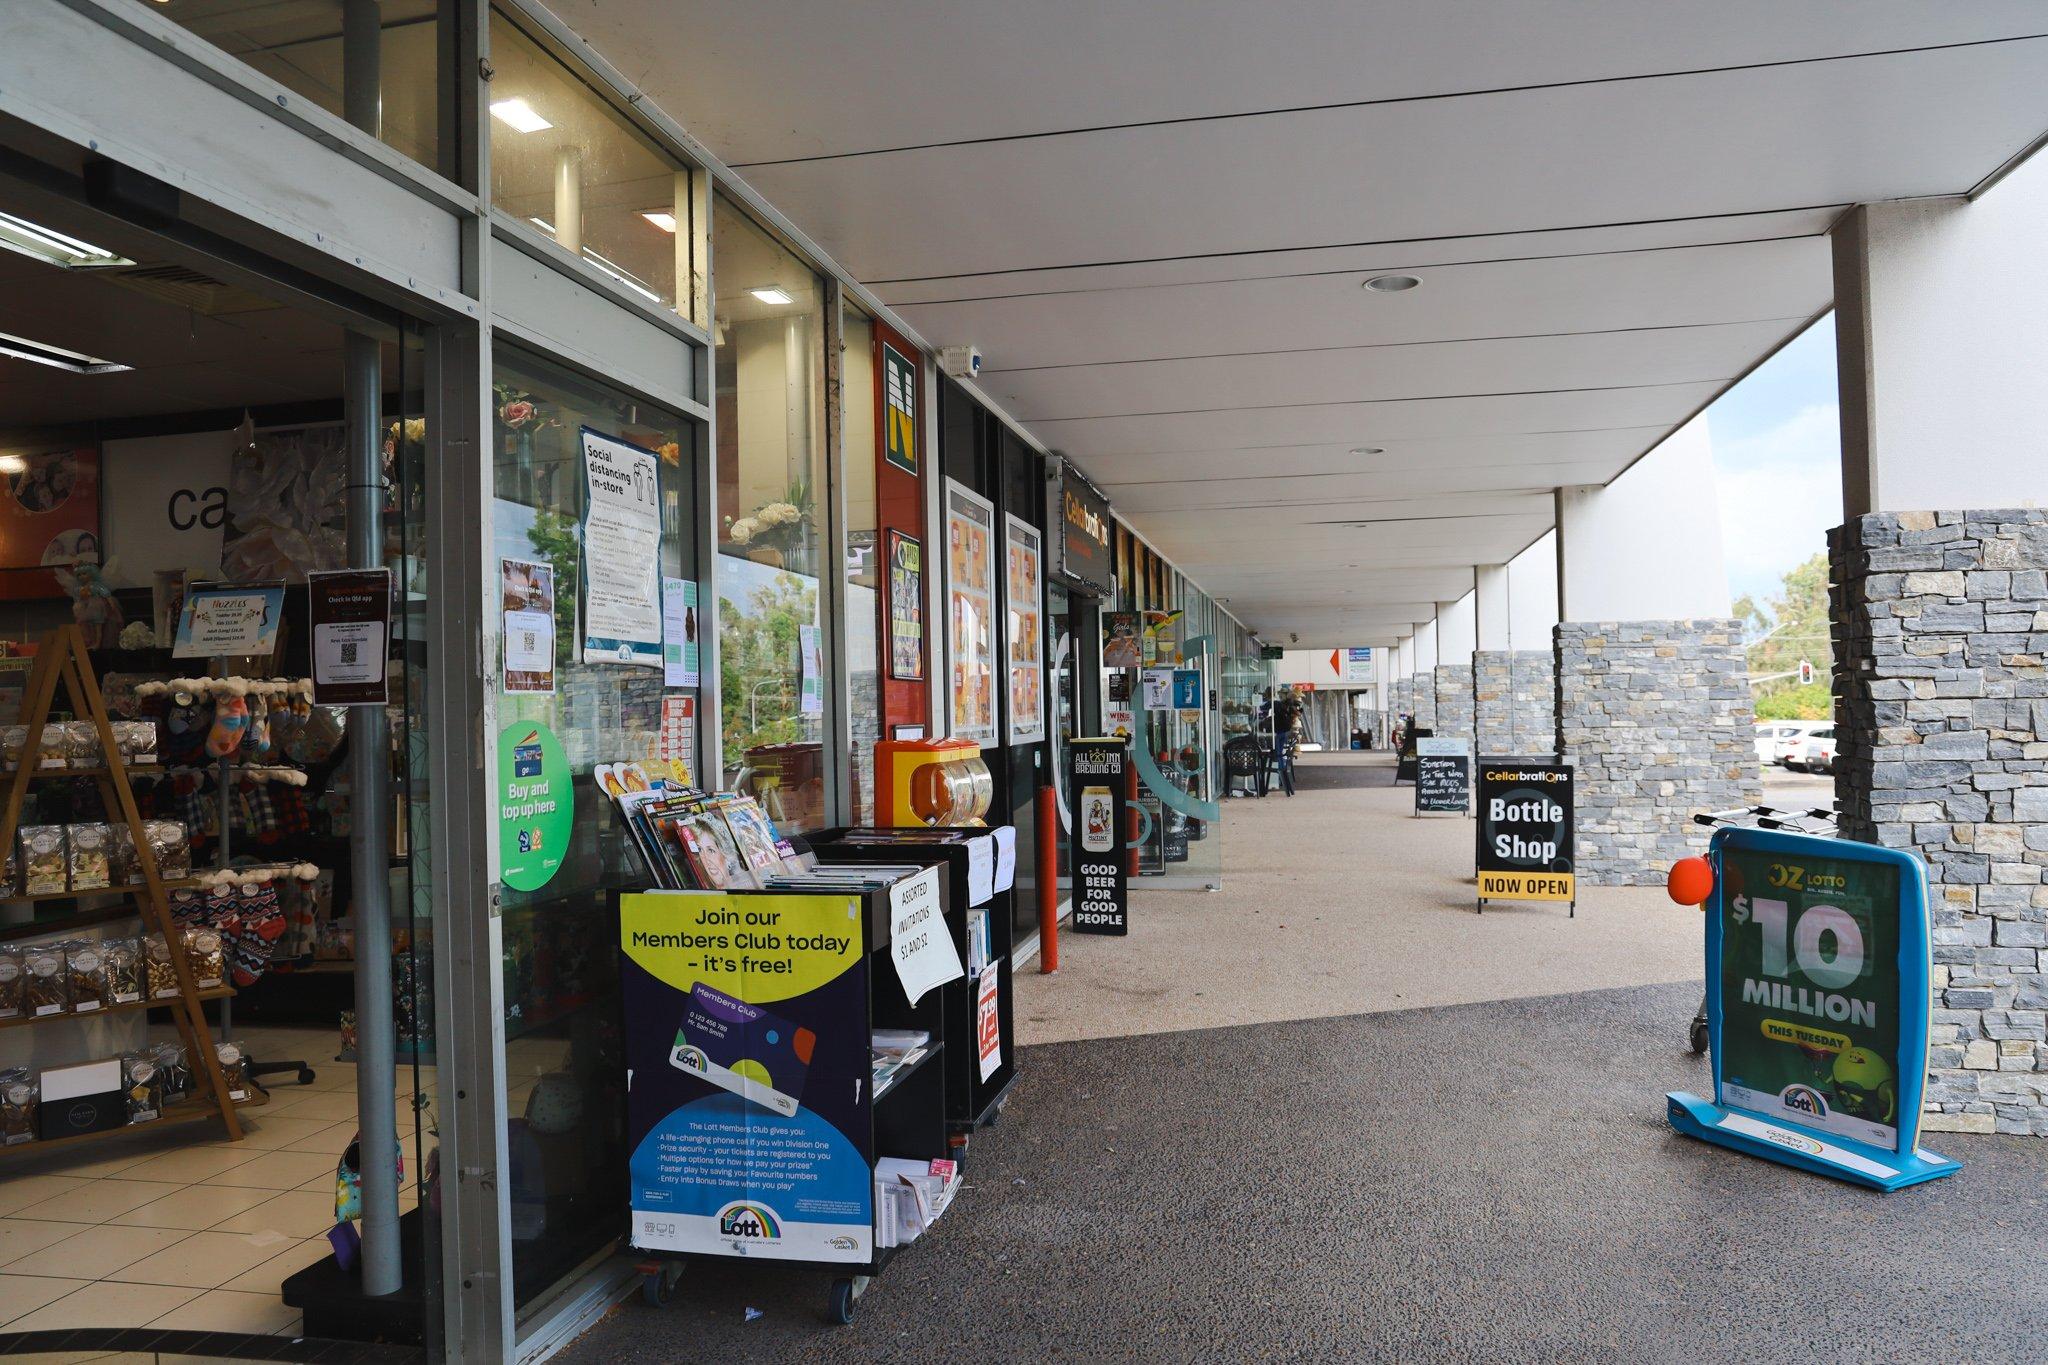 Eastside Village shops, including a newsagency and a cafe